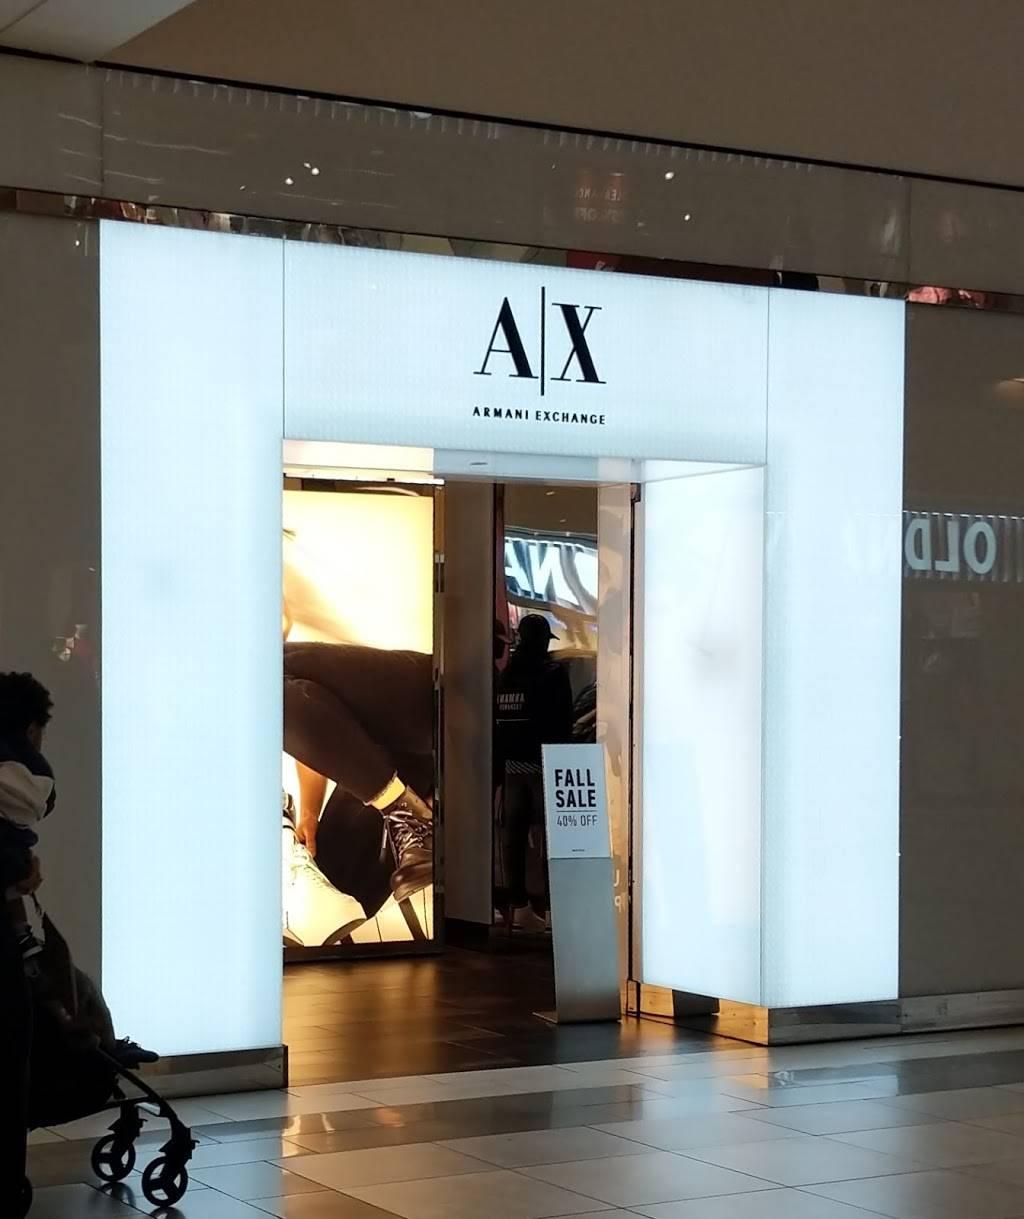 A|X Armani Exchange - clothing store  | Photo 3 of 7 | Address: 1400 Willowbrook Mall Space 1840, Wayne, NJ 07470, USA | Phone: (973) 237-0244